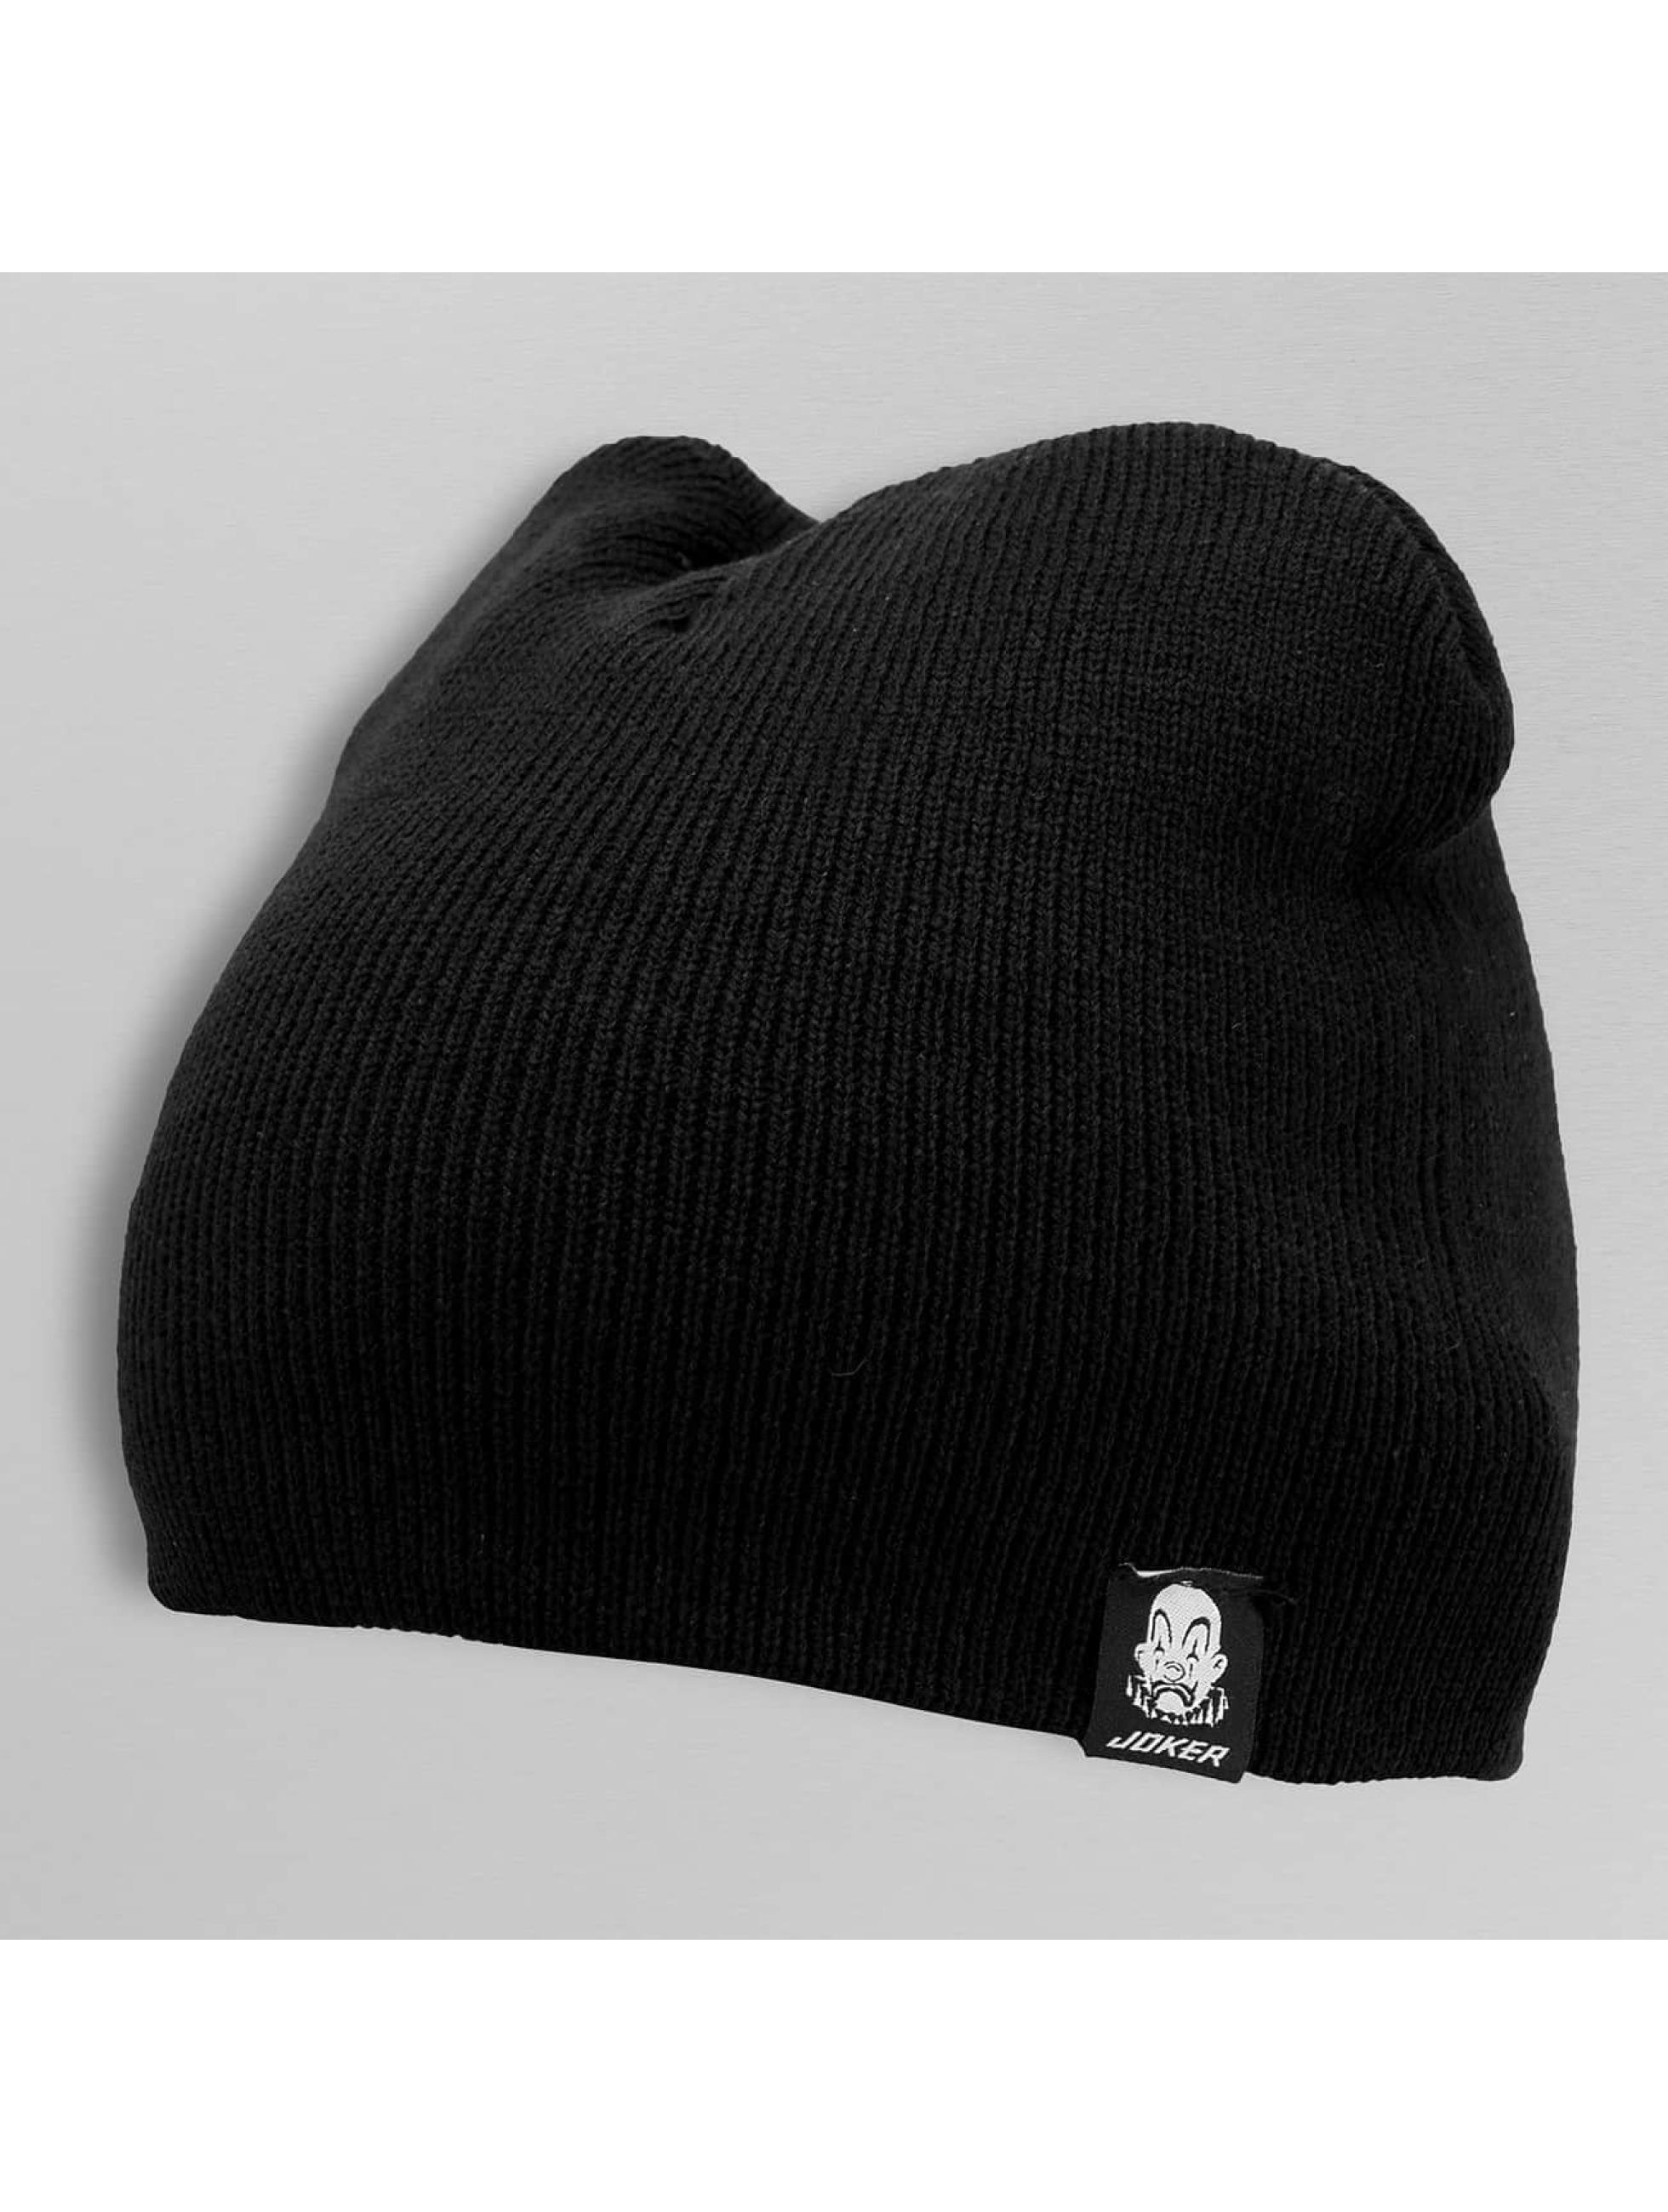 Joker шляпа Basic черный